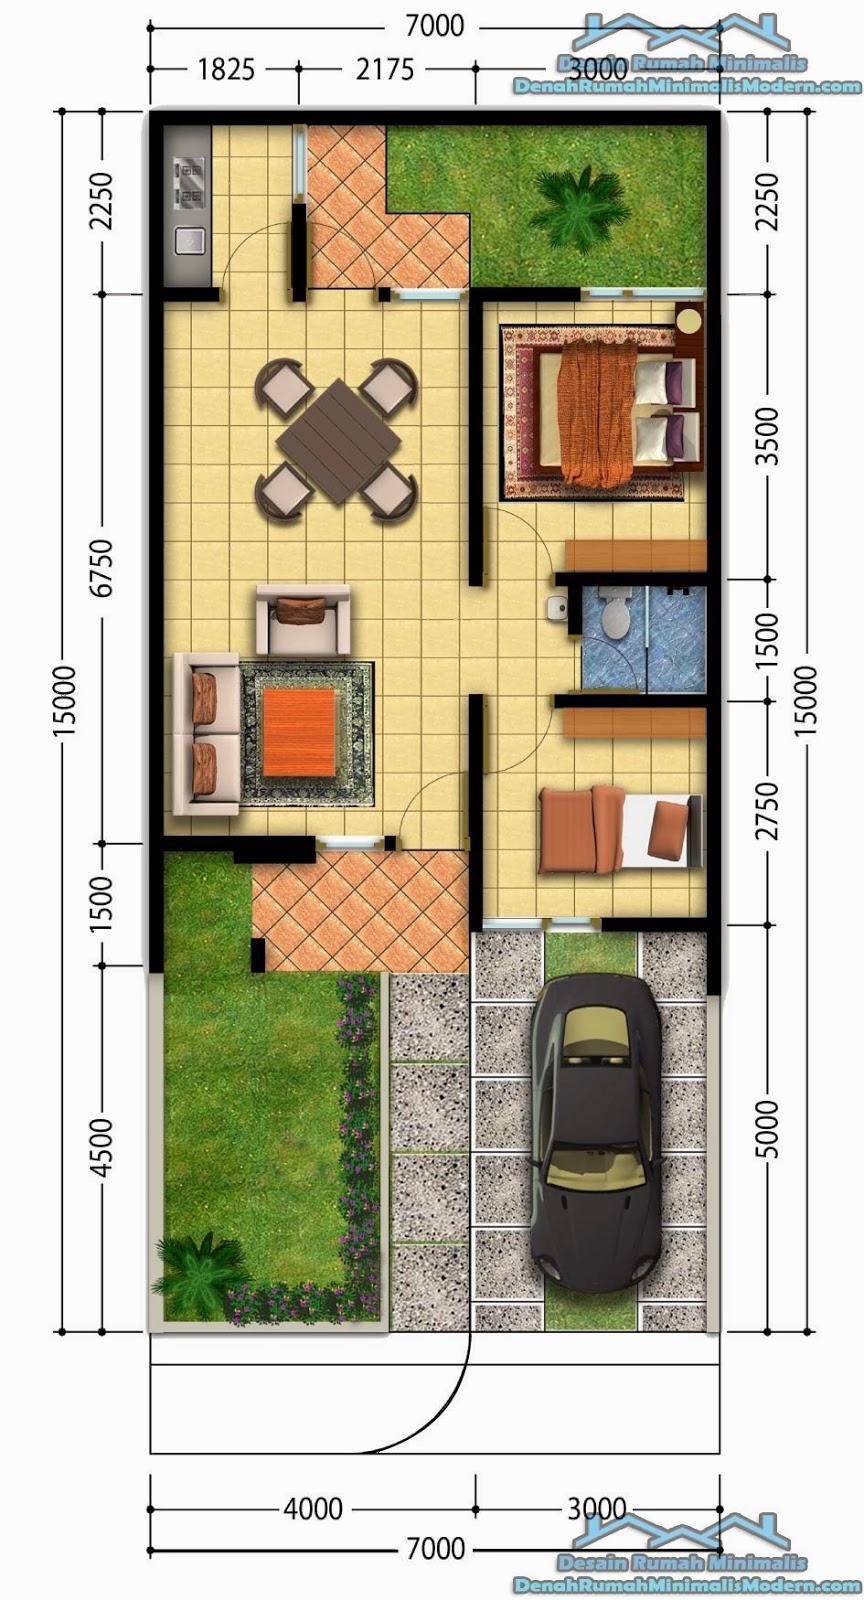 Gambar denah rumah minimalis modern 2015